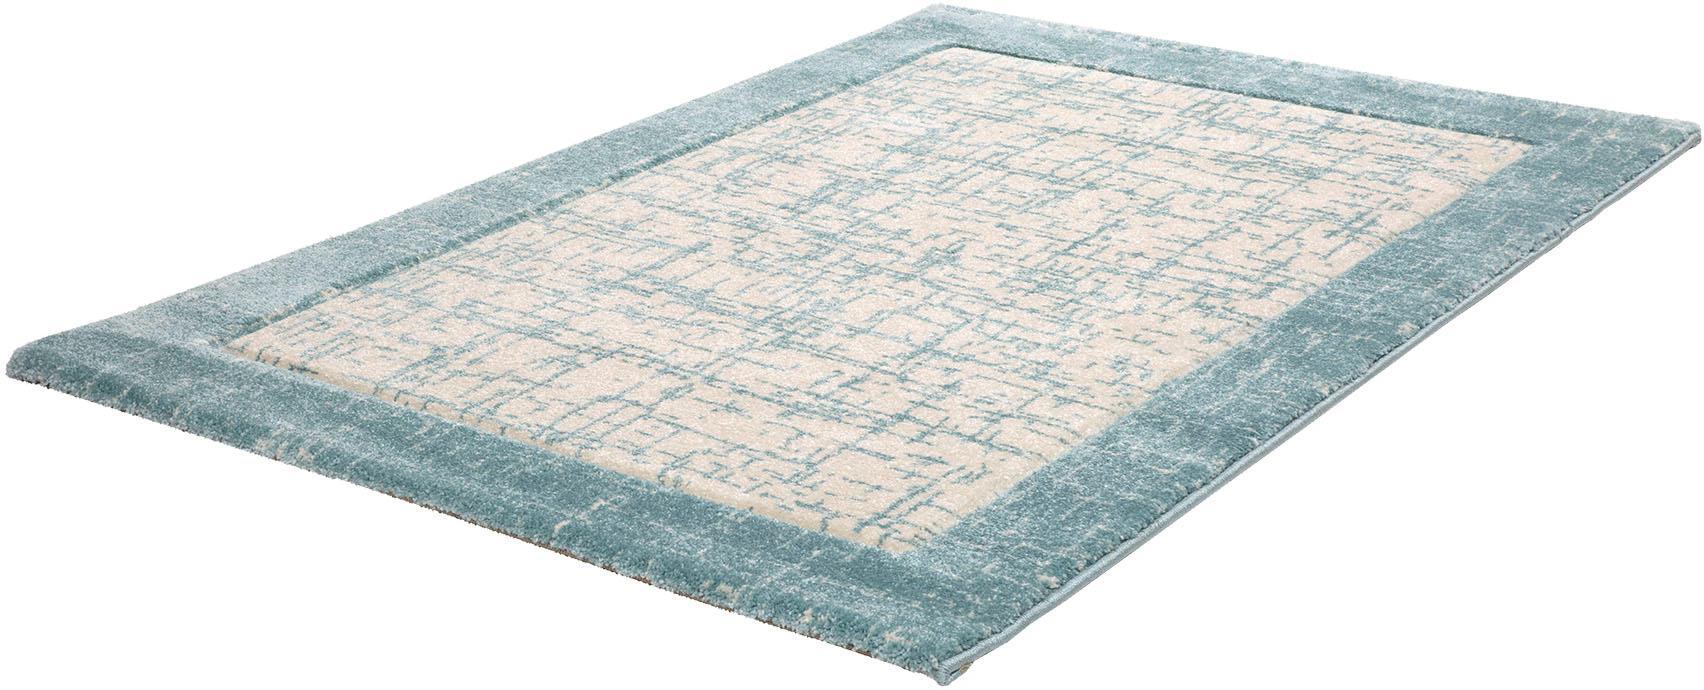 Hochflor-Teppich My Hampton 711 Obsession rechteckig Höhe 25 mm maschinell gewebt